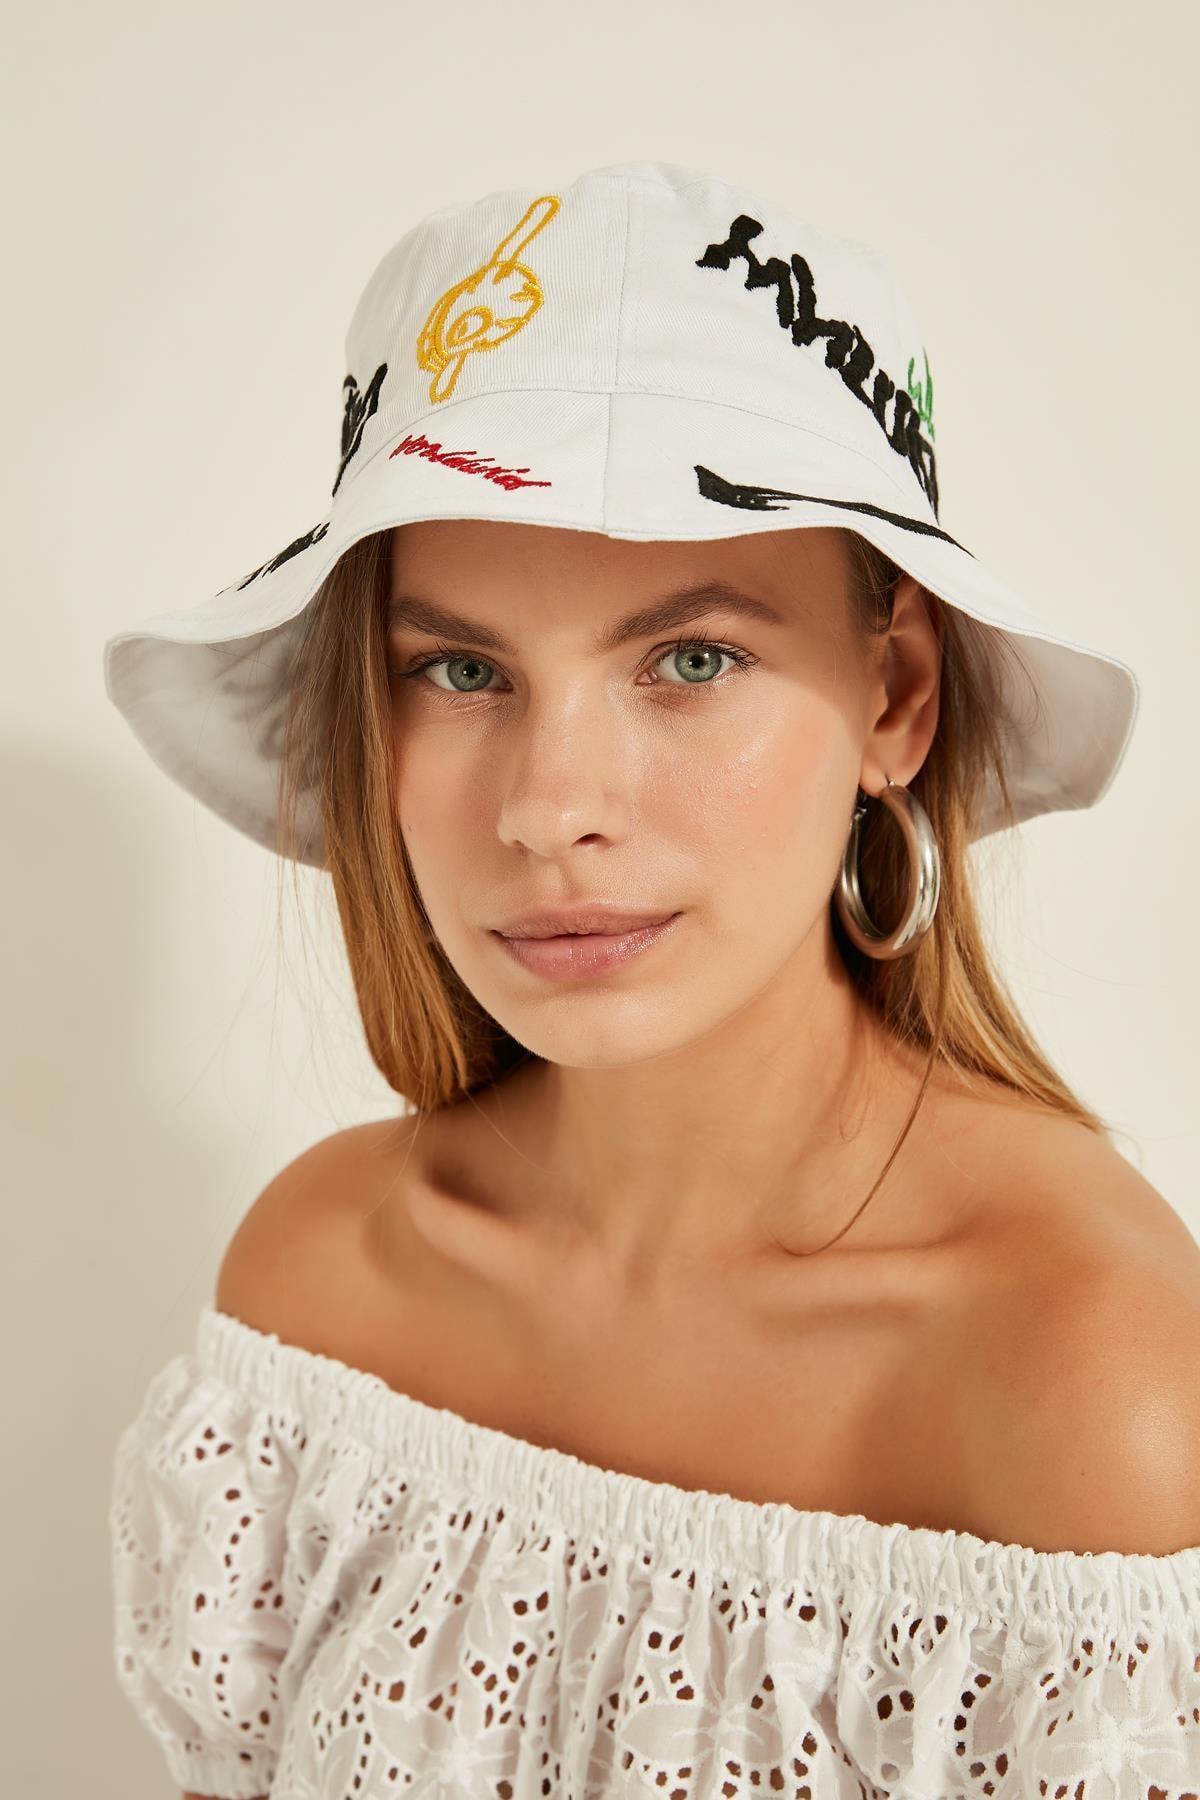 Y-London 13250 Baskı Detaylı Beyaz Bucket Şapka